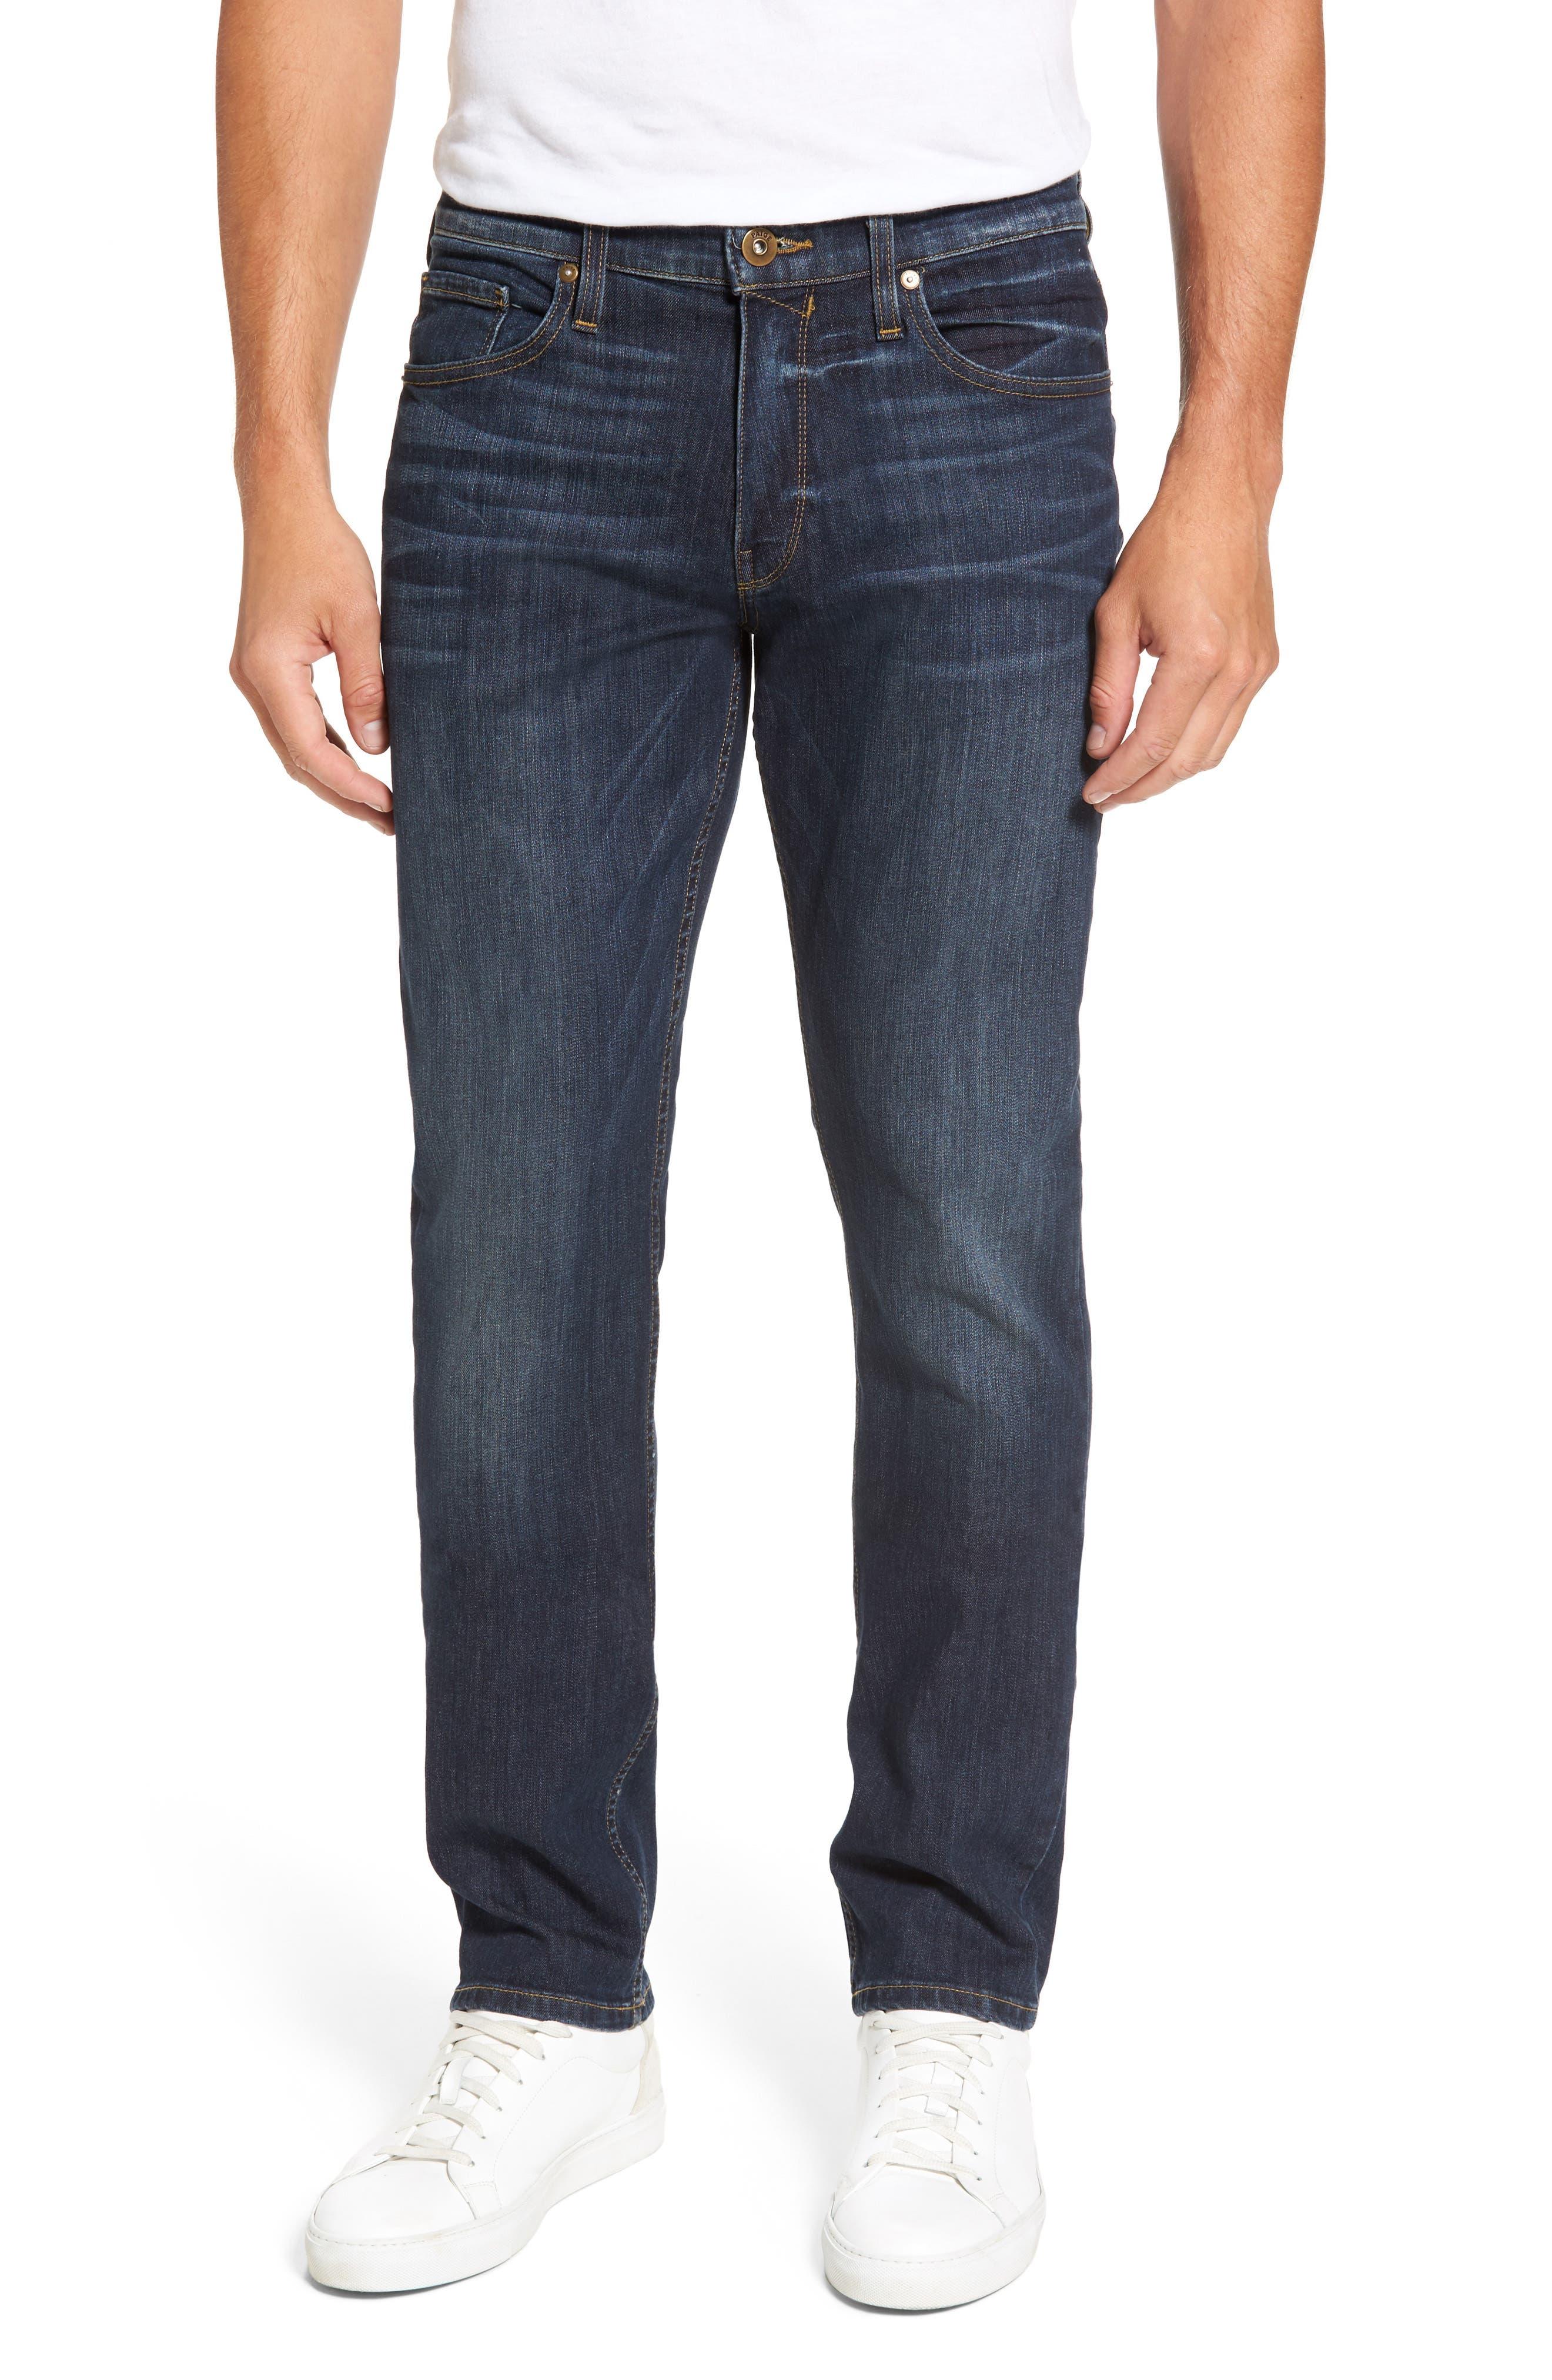 PAIGE,                             Legacy - Federal Slim Straight Leg Jeans,                             Main thumbnail 1, color,                             400